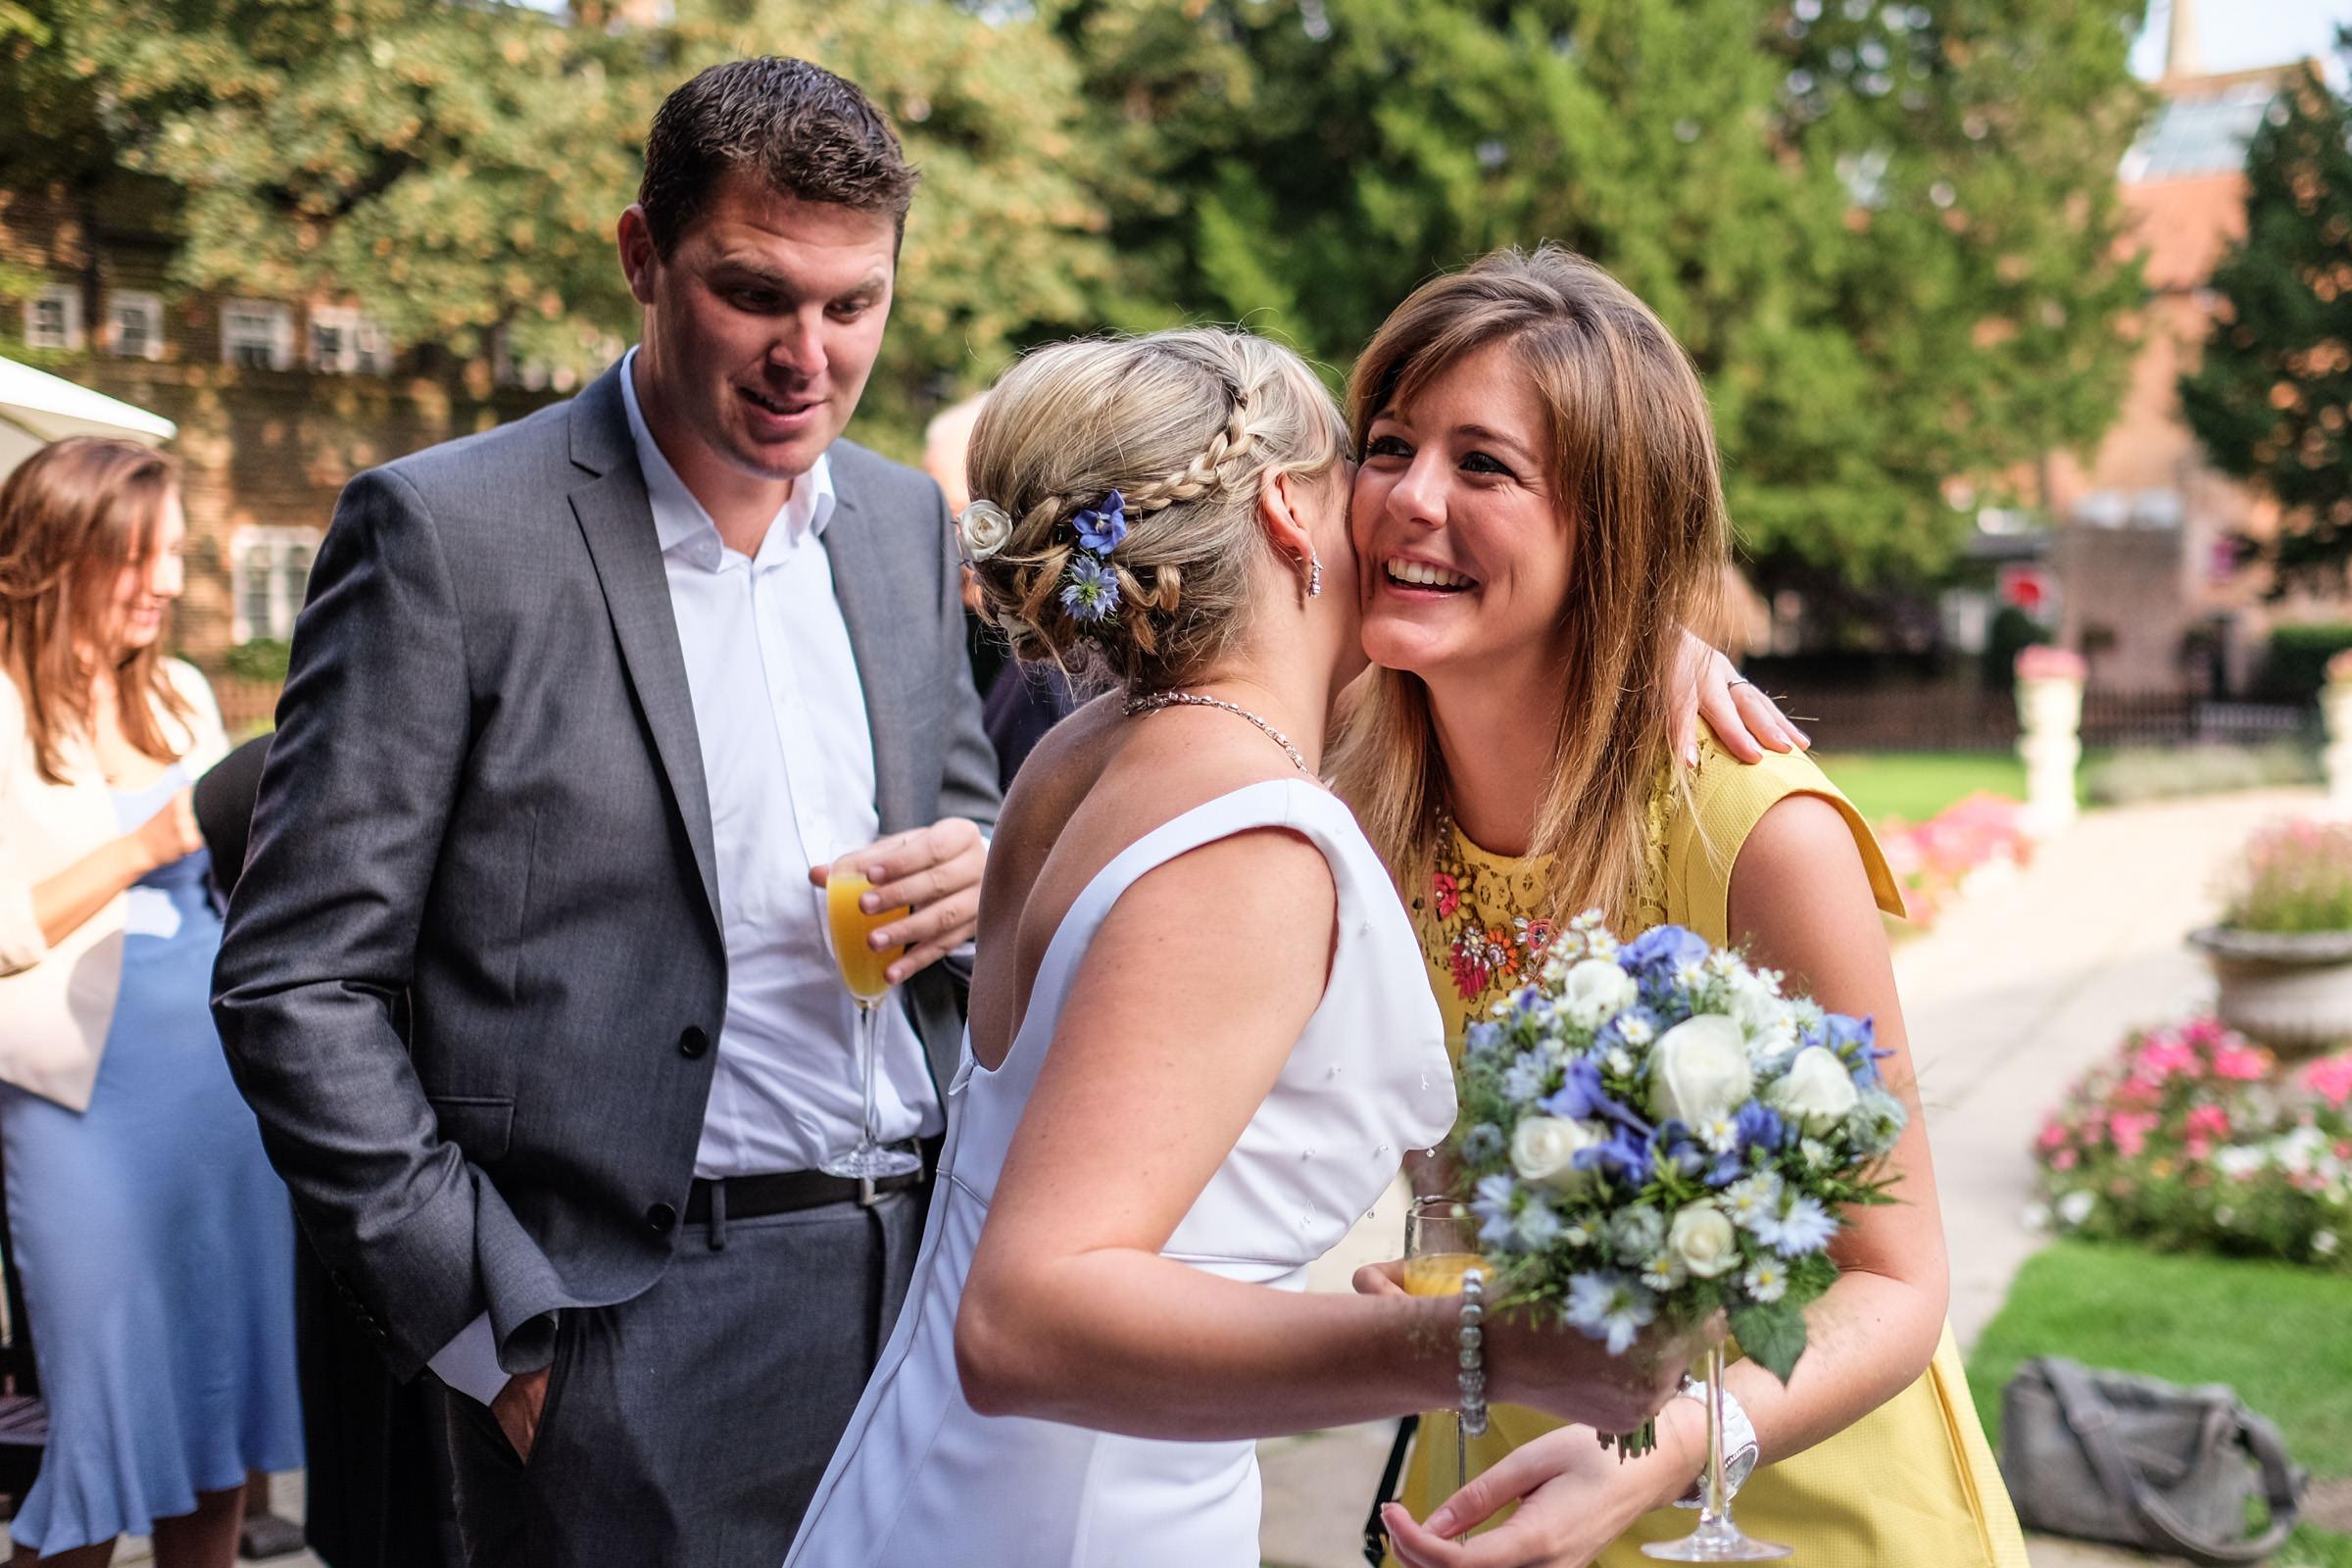 Wedding+at+The+Farnham+Bush+Hotel+in+Surrey+019.jpg